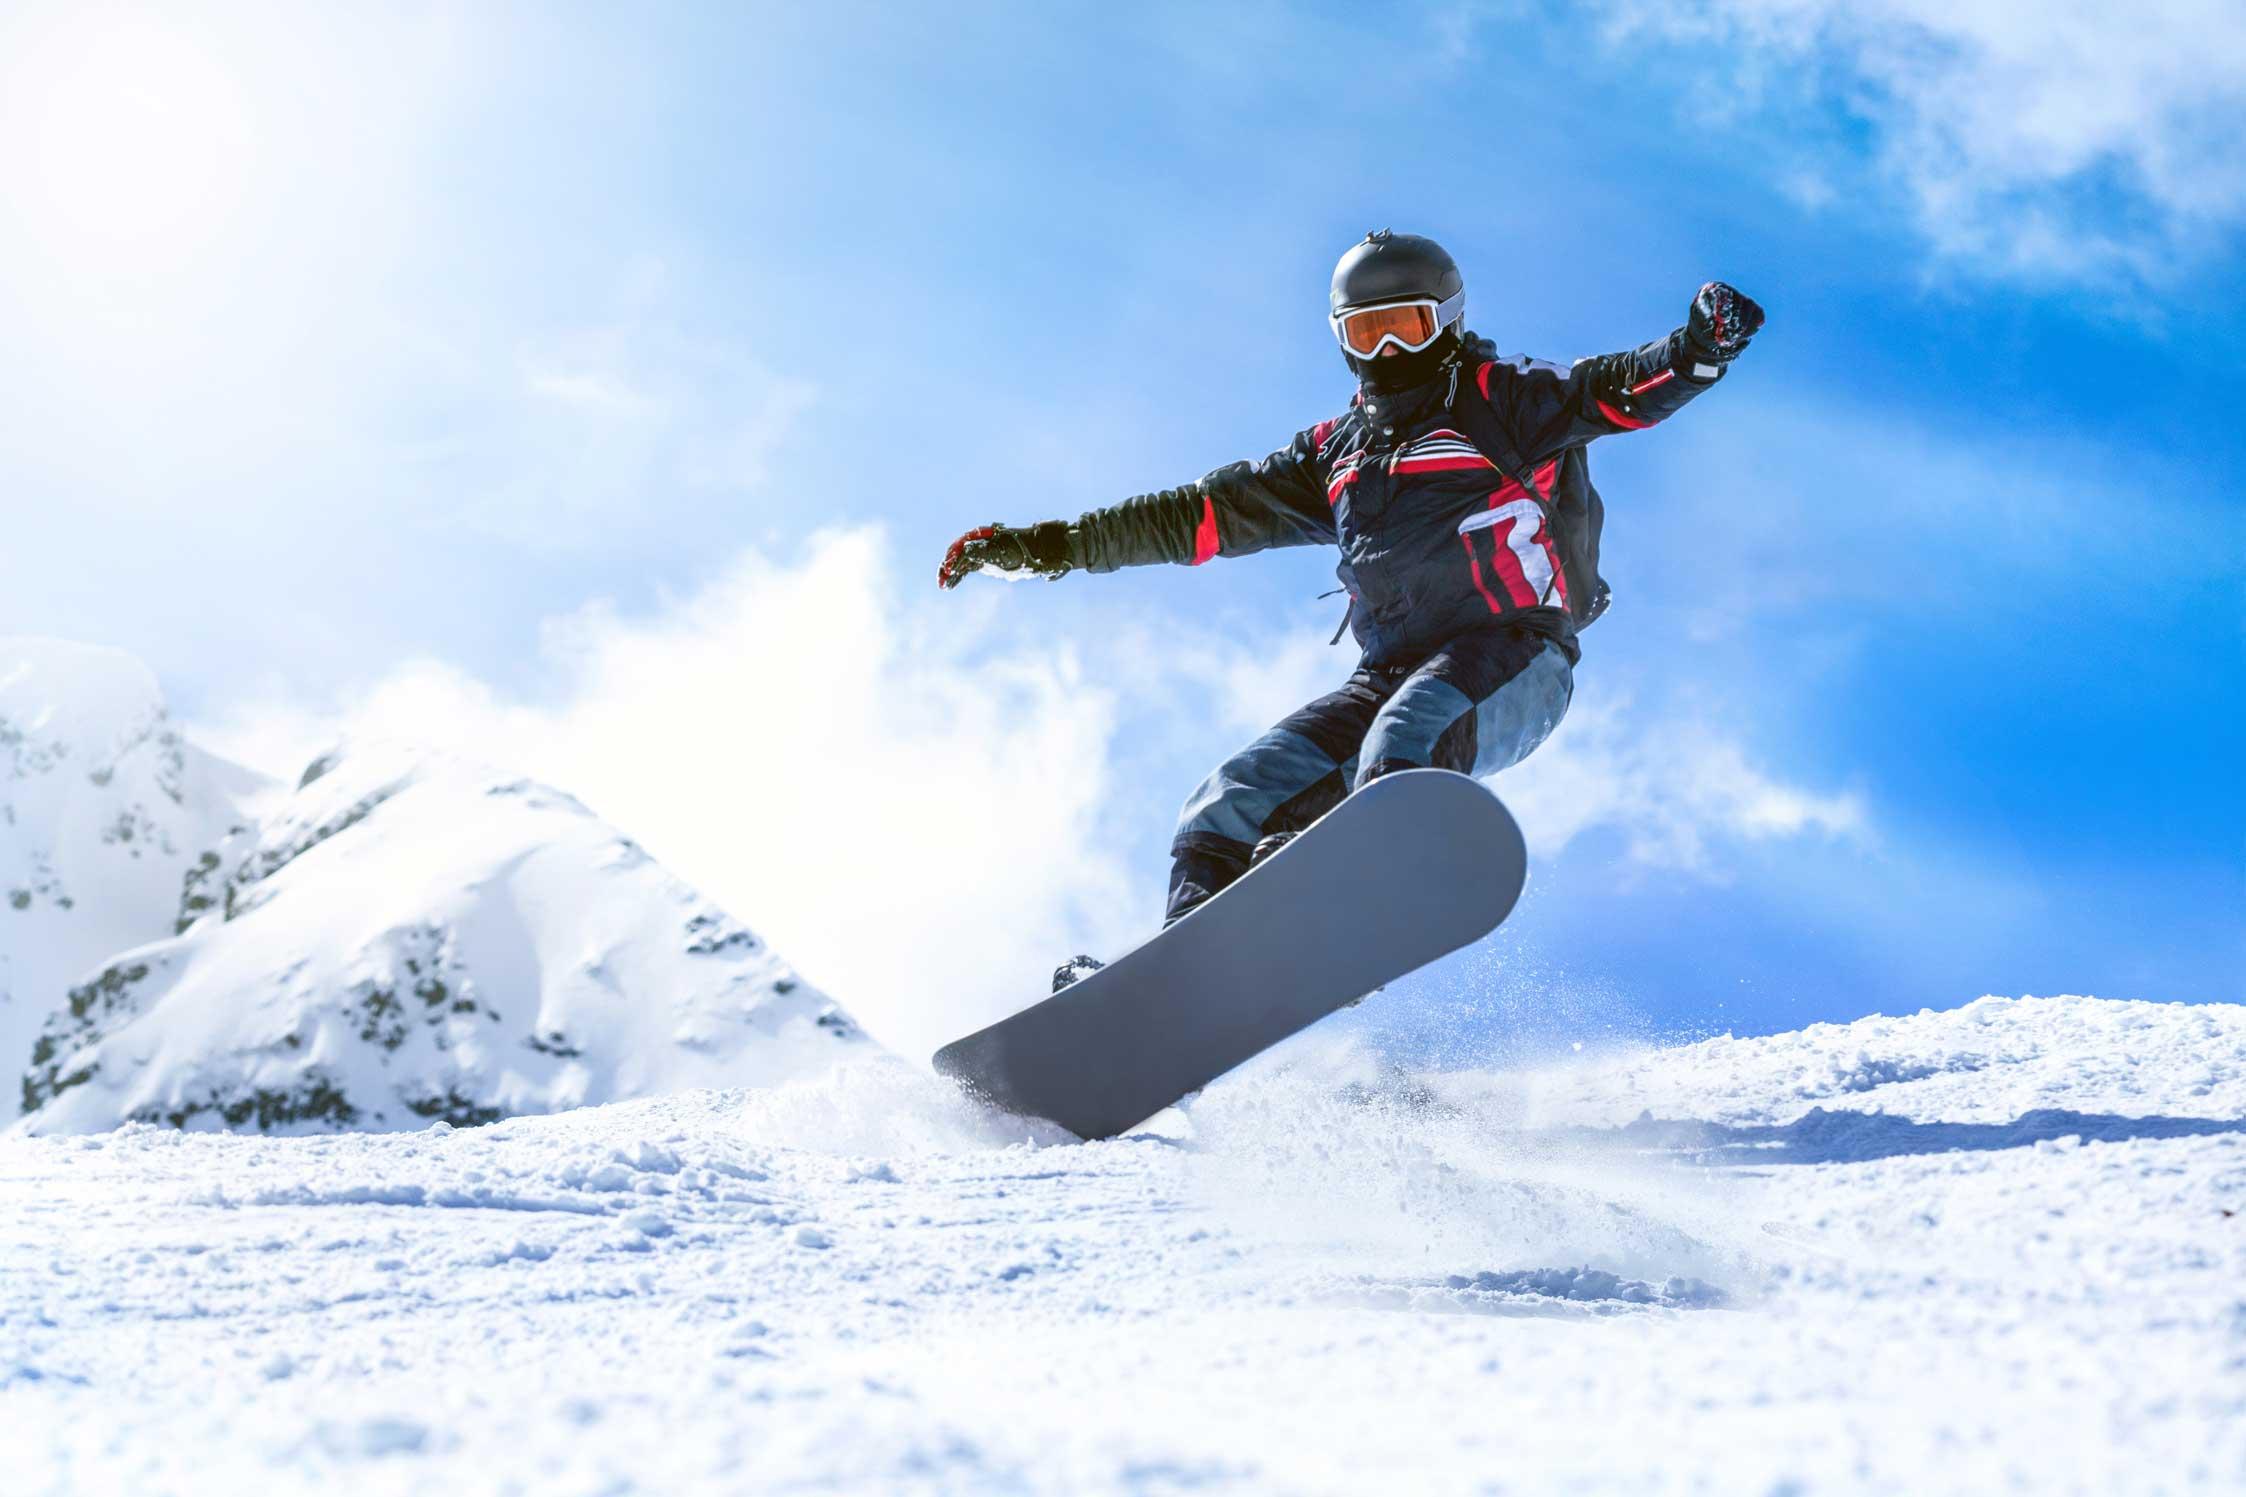 картинки про сноубордистов здание завода виду